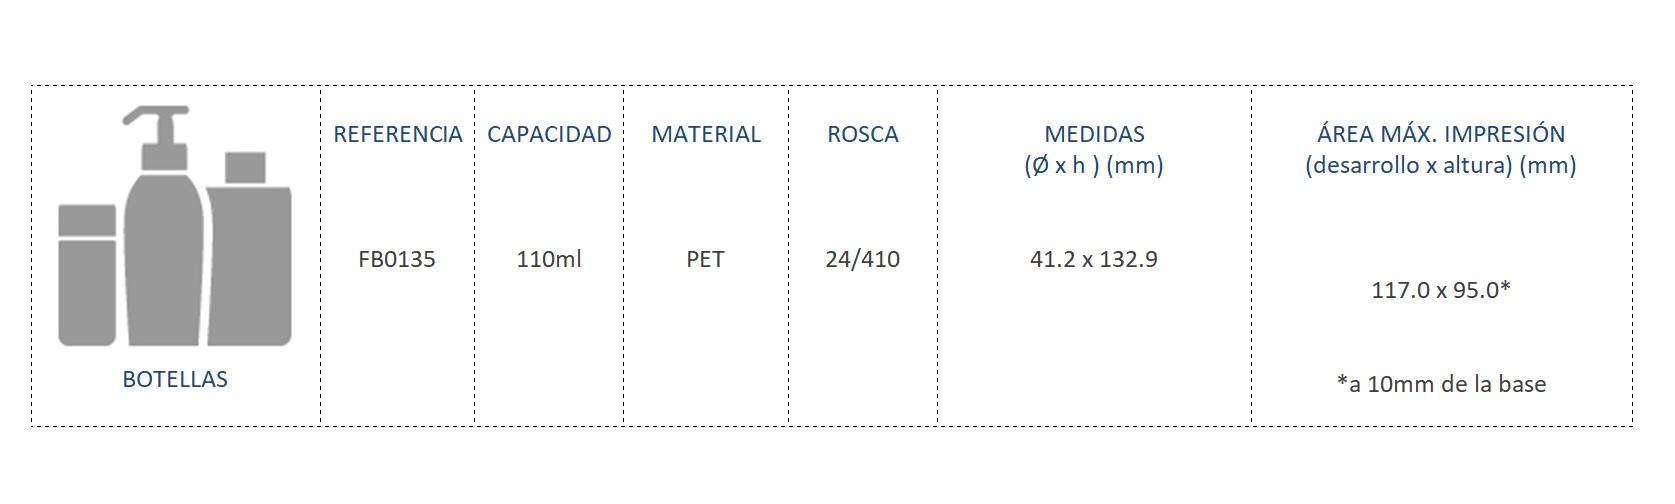 Cuadro de materiales FB0135